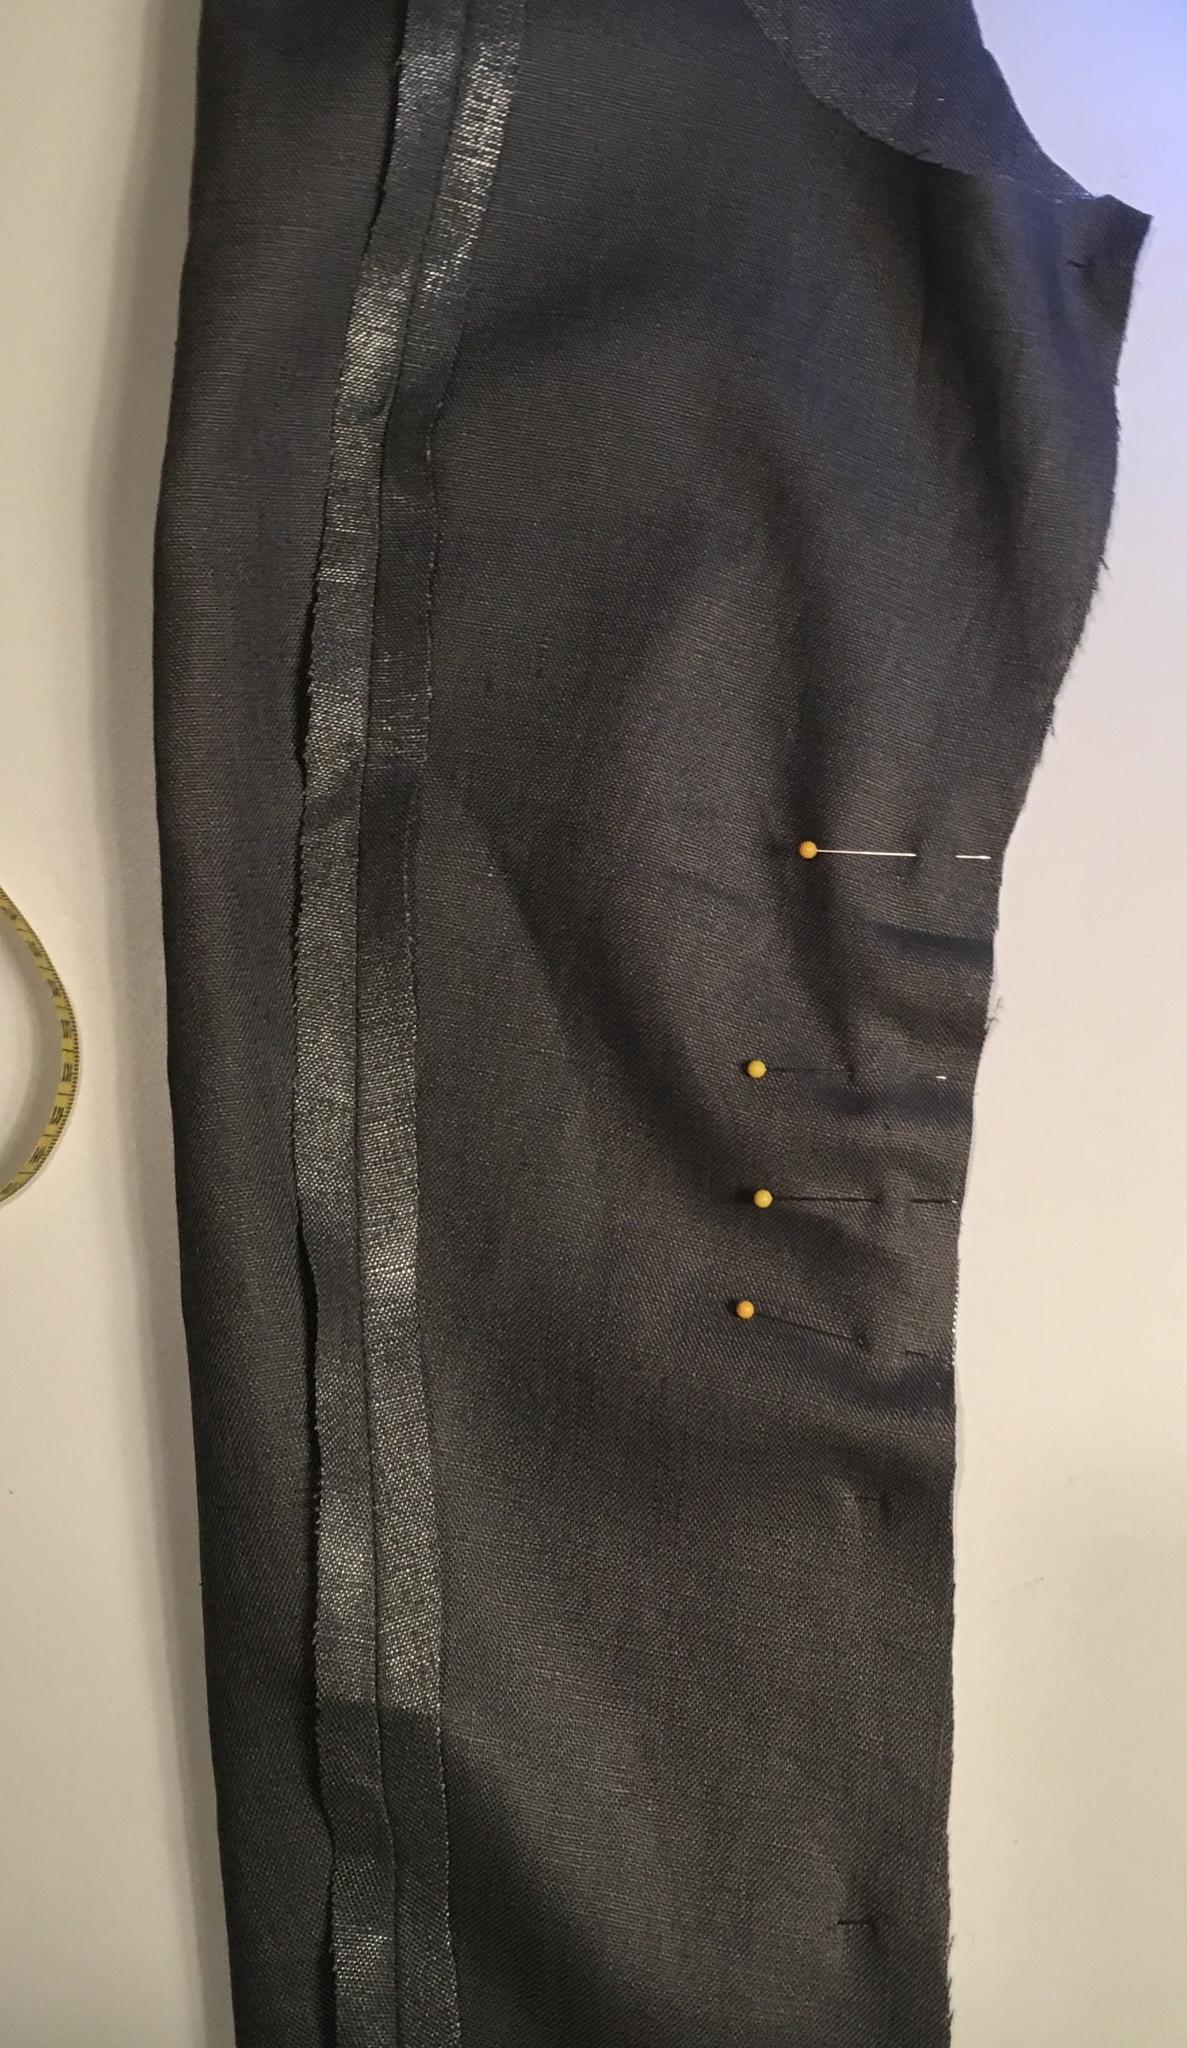 jacket sleeve ease.jpg